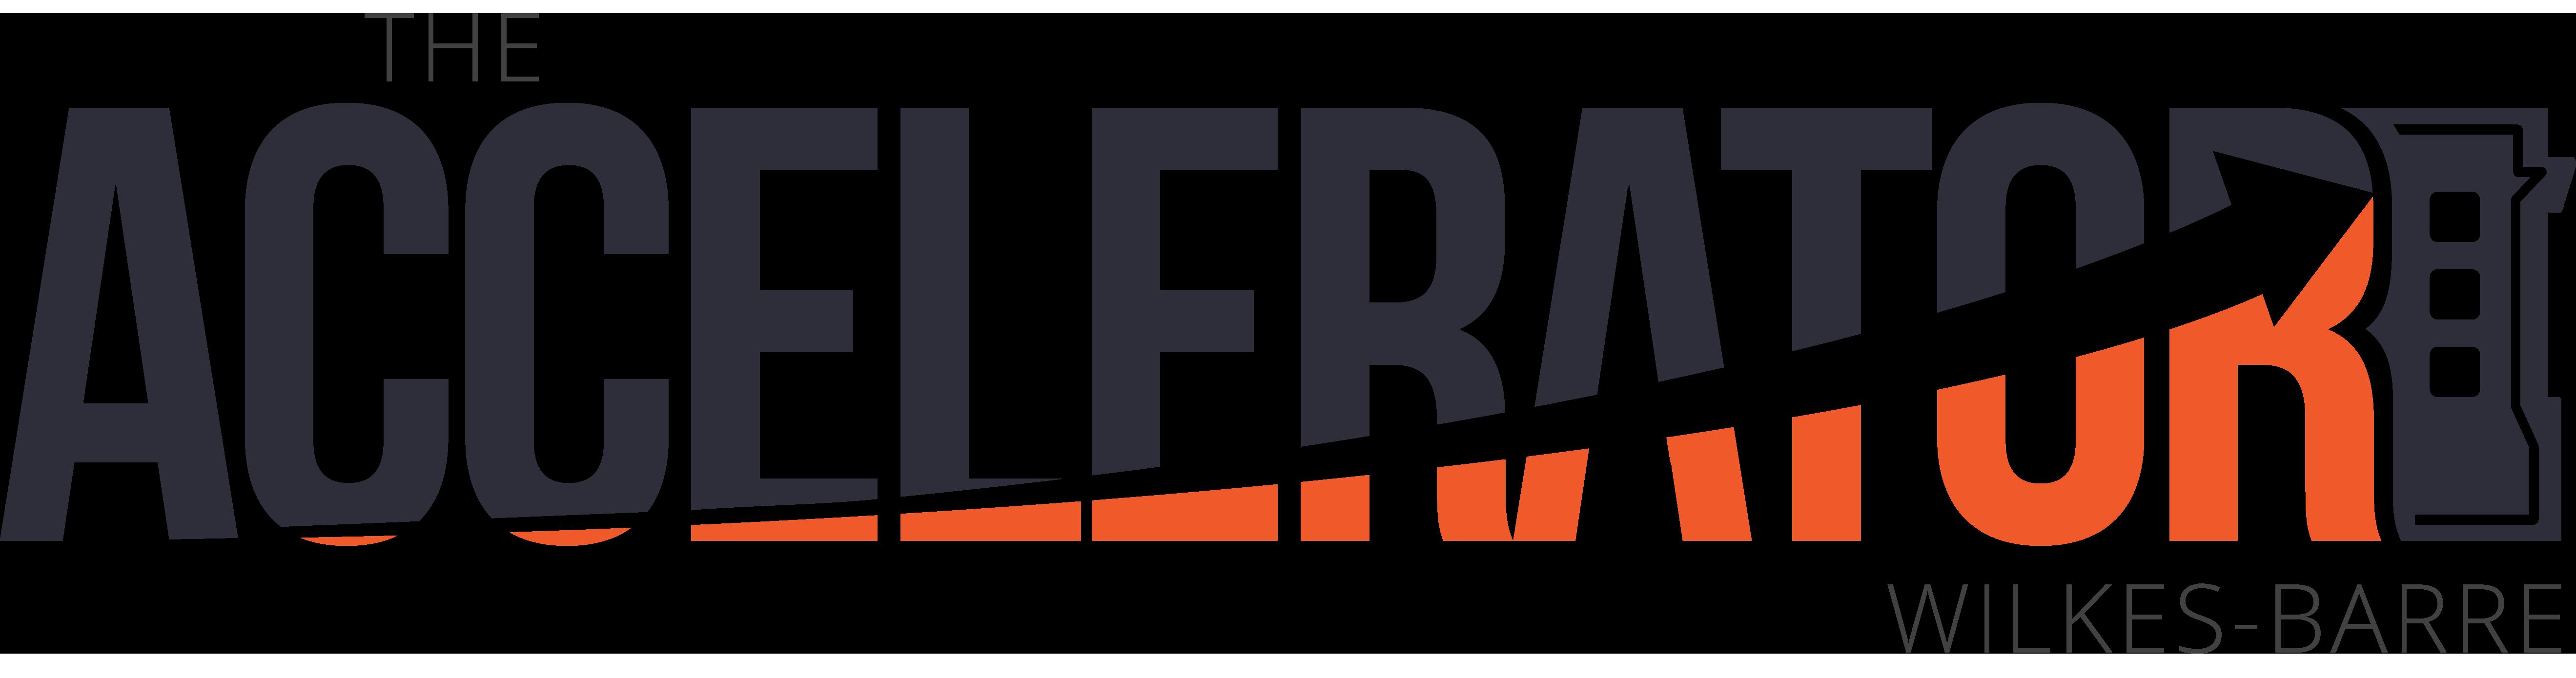 The Accelerator Wilkes-Barre Logo